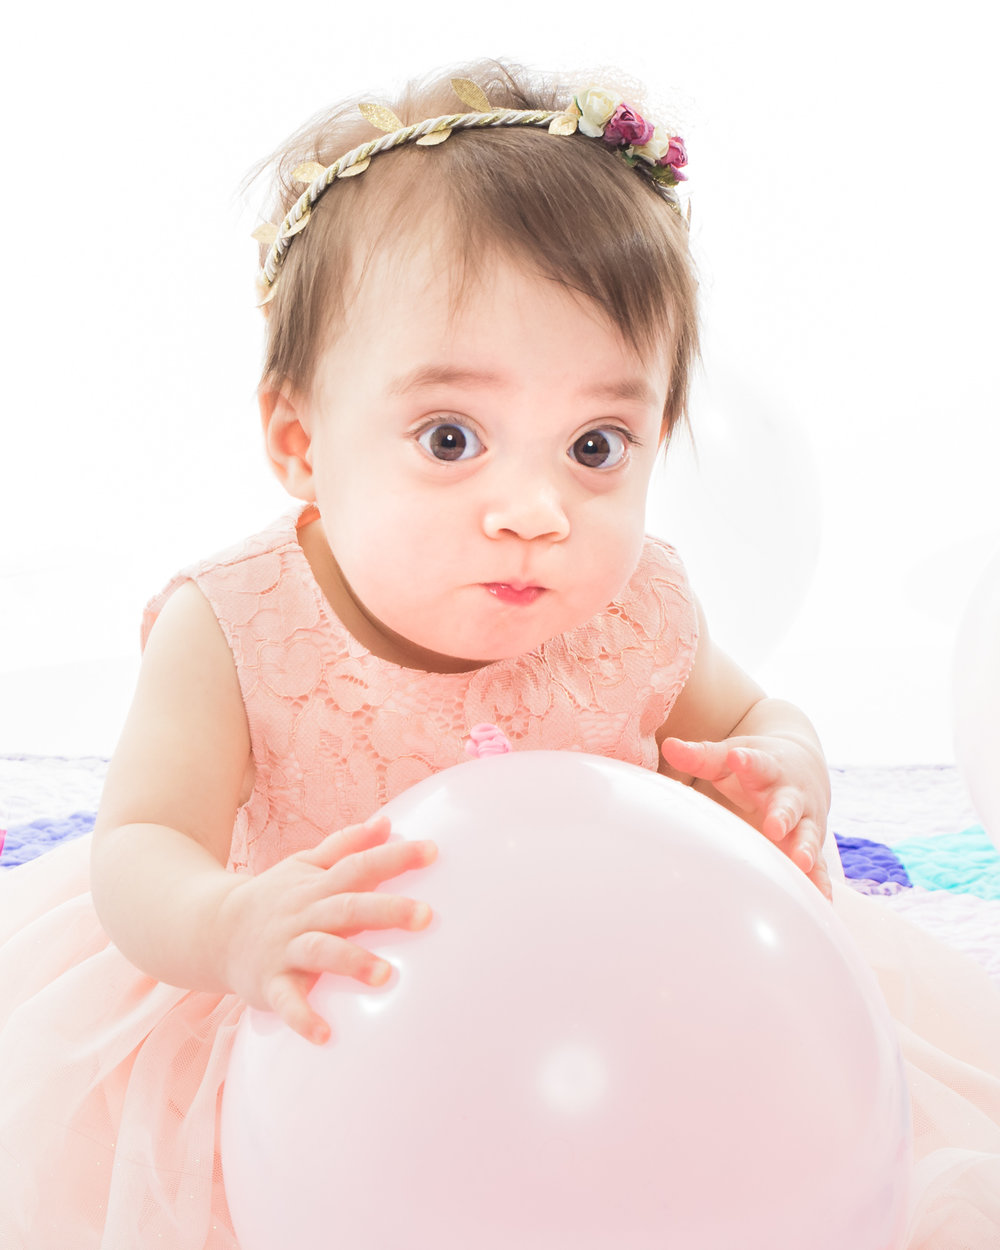 2018_February_04-Veronica_Sullivan_One_Year_Baby_Pics-44803-Edit.jpg